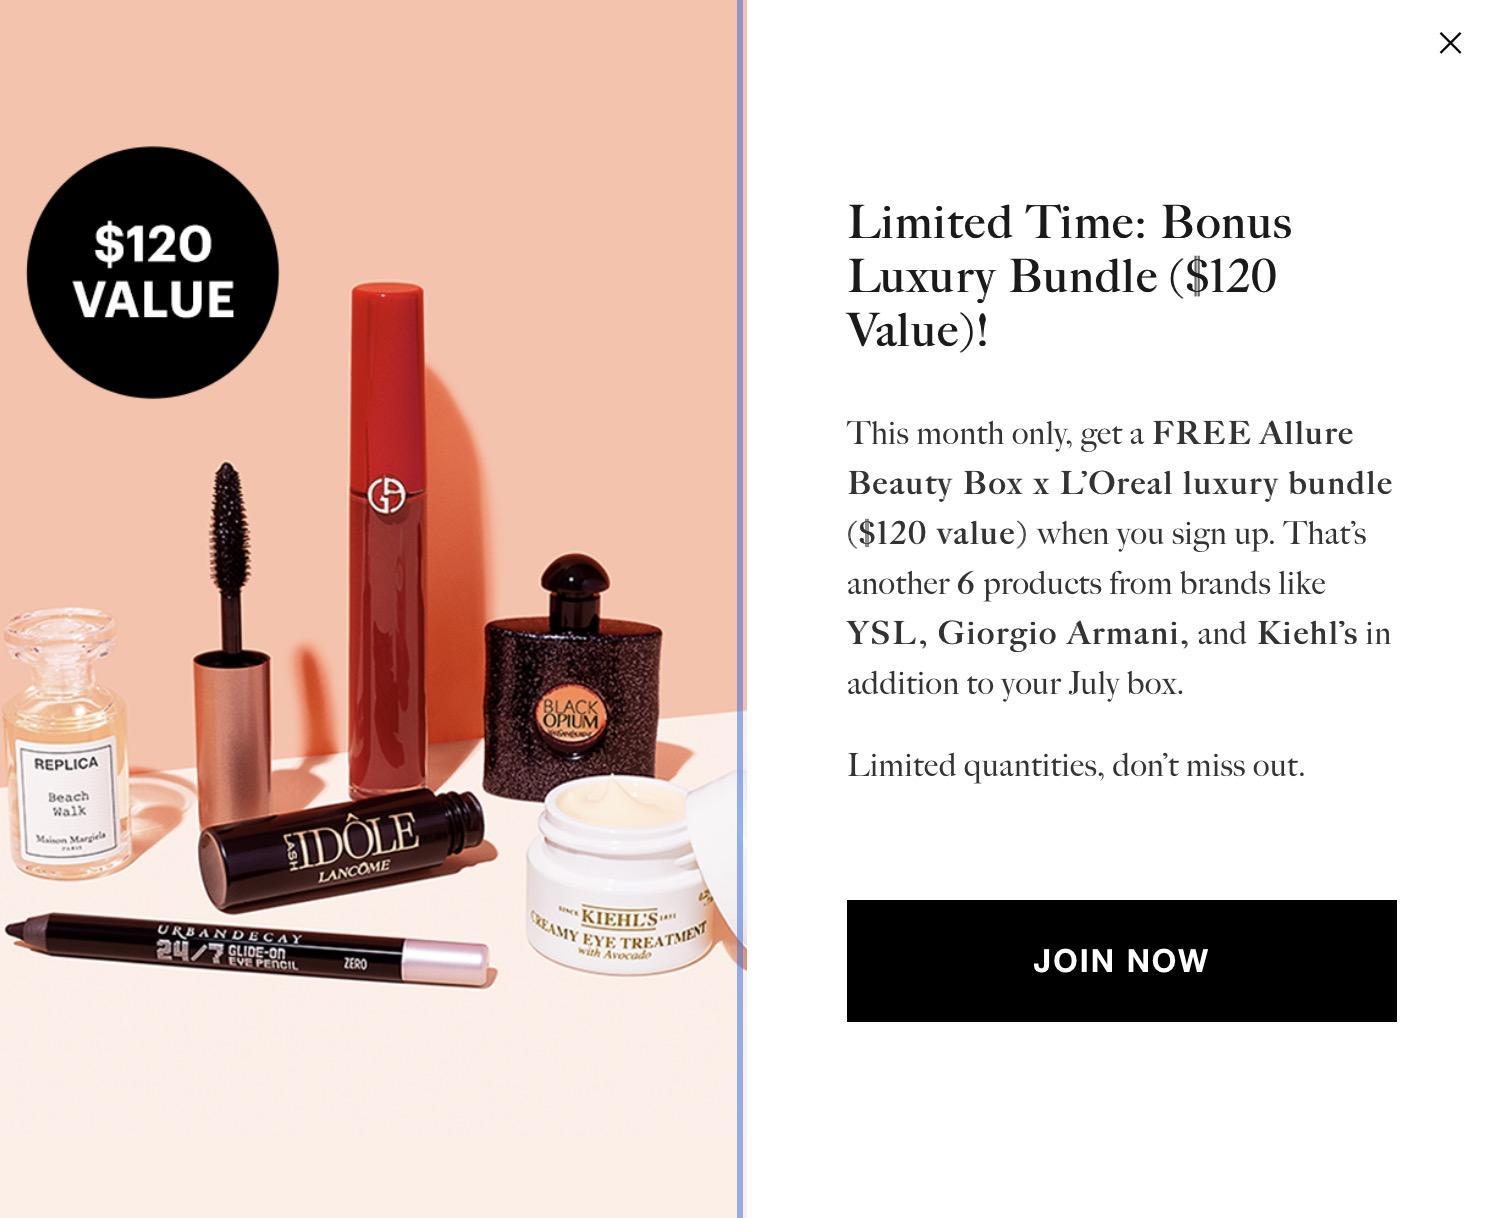 Allure Beauty Box Coupon Code – FREE Allure Beauty Box x L'Oreal luxury bundle ($120 value)!